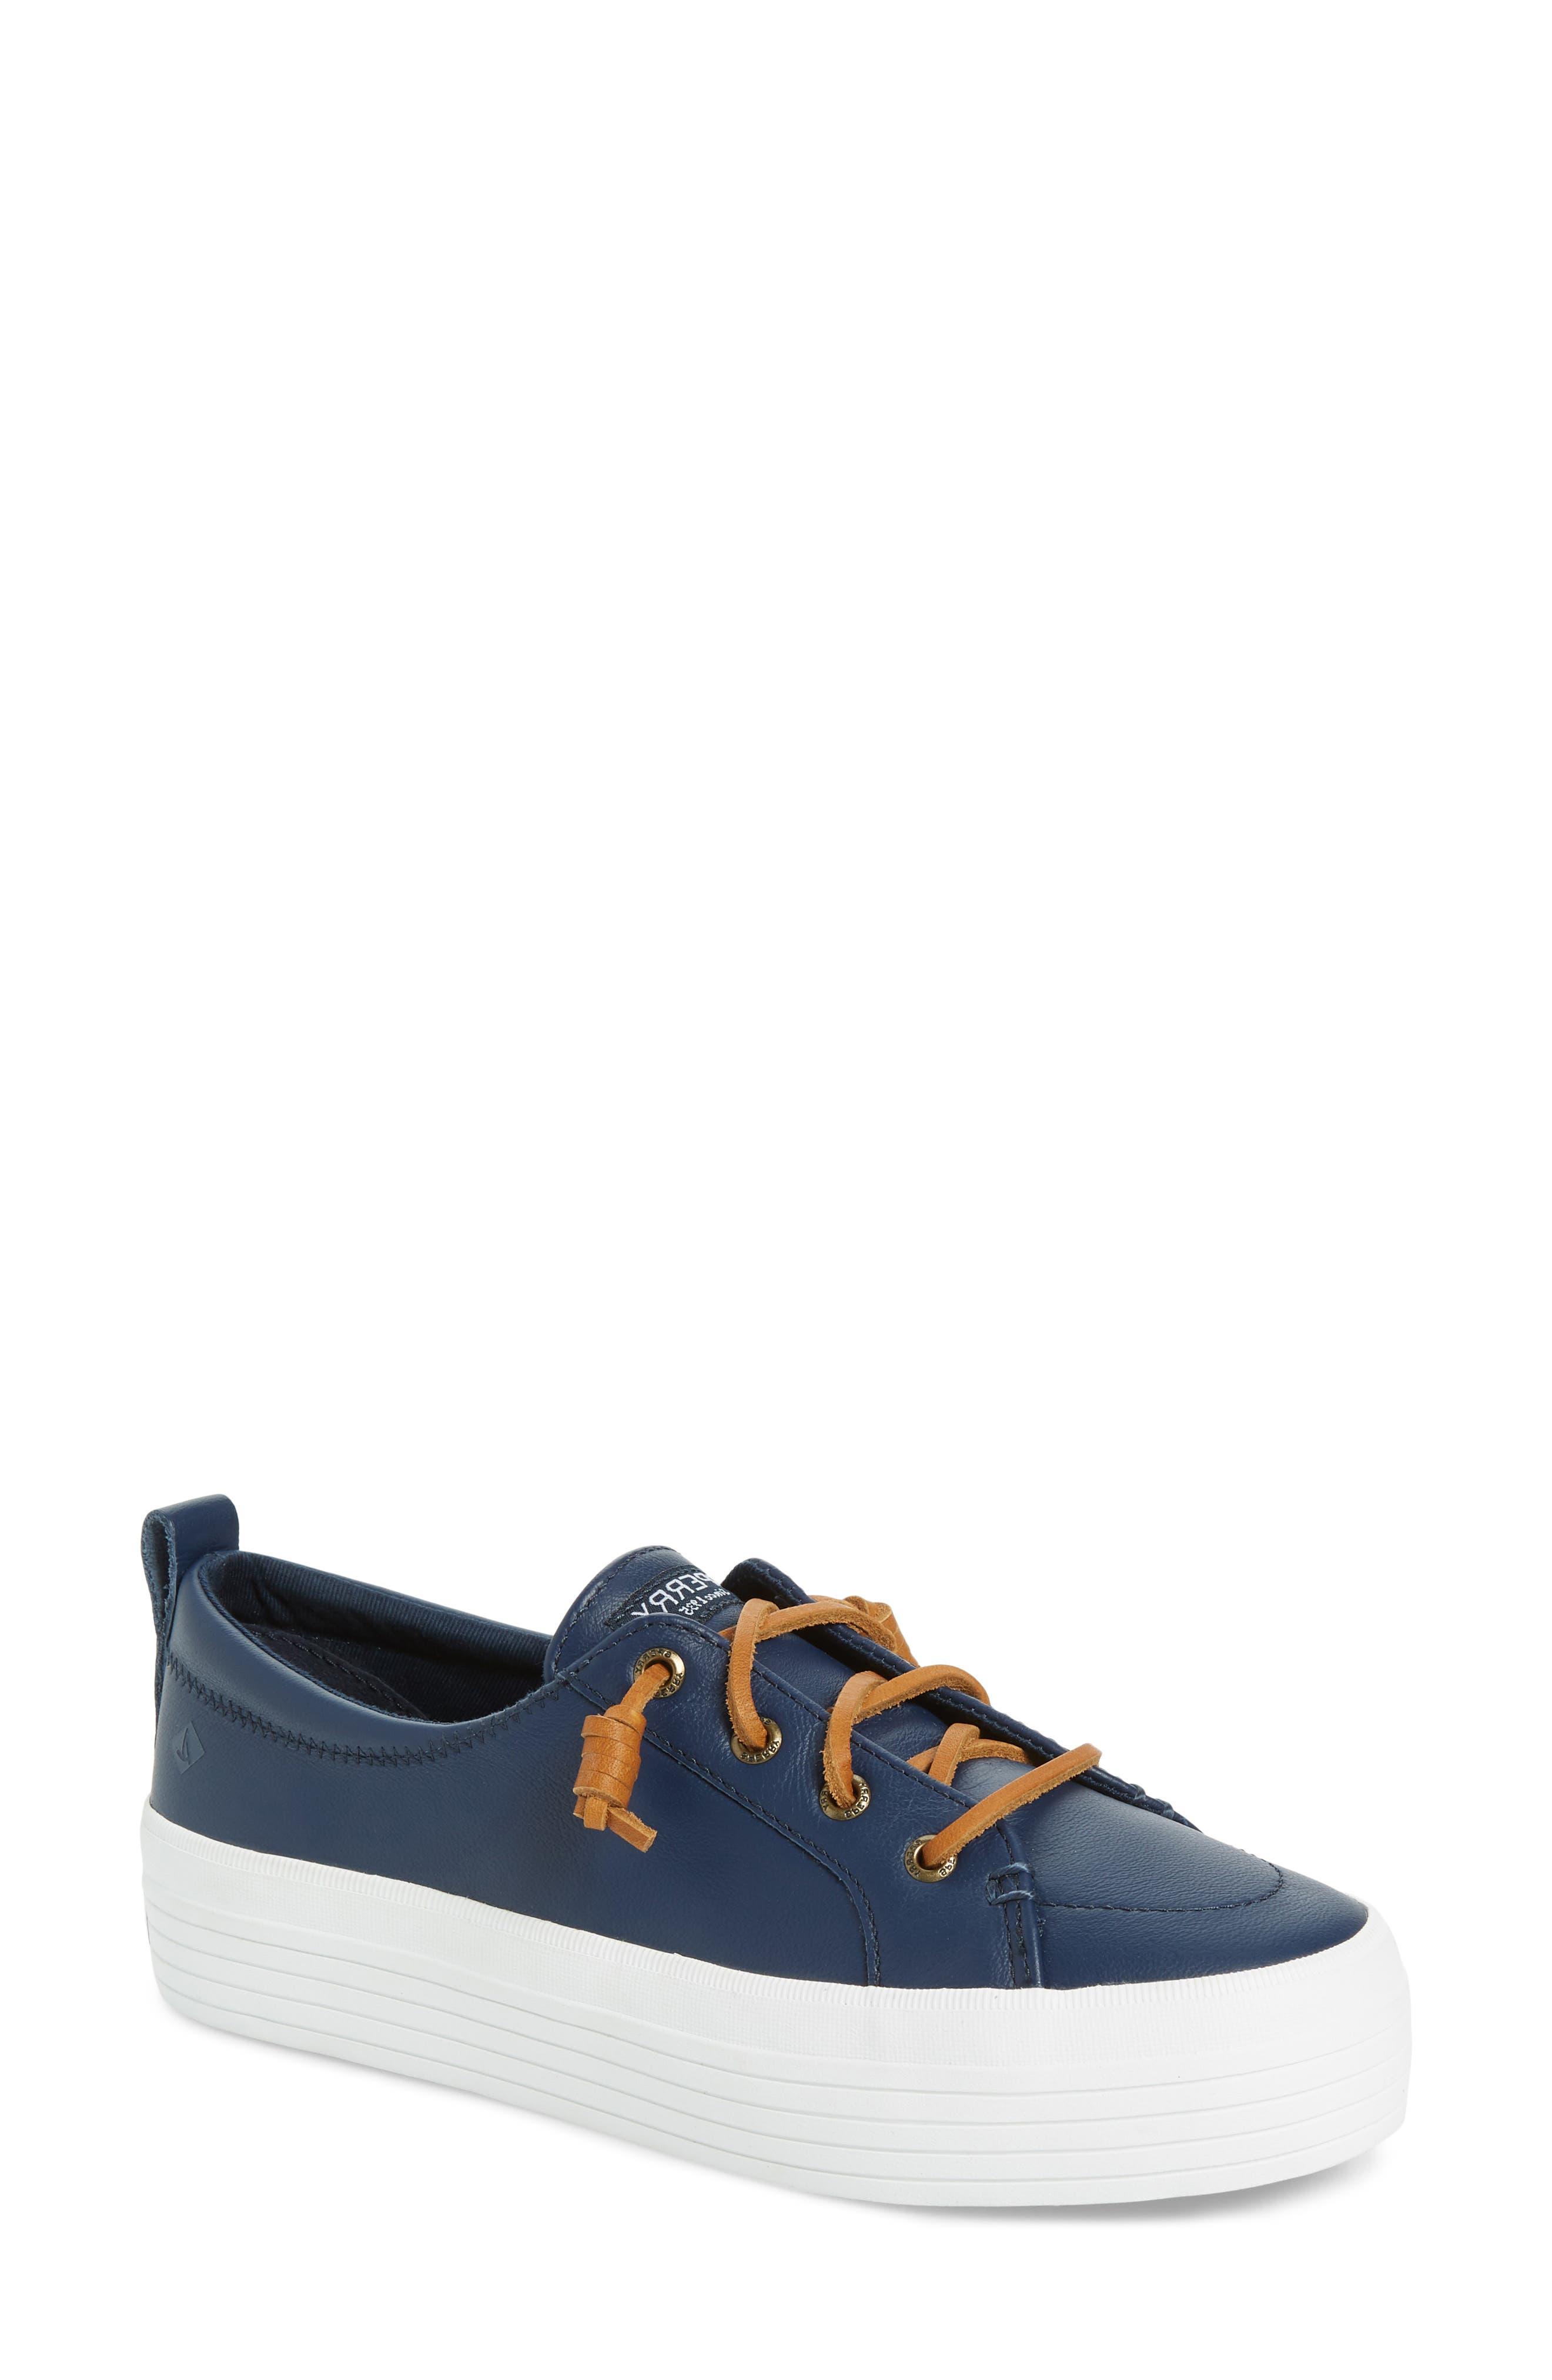 Sperry Crest Vibe Platform Sneaker (Women)